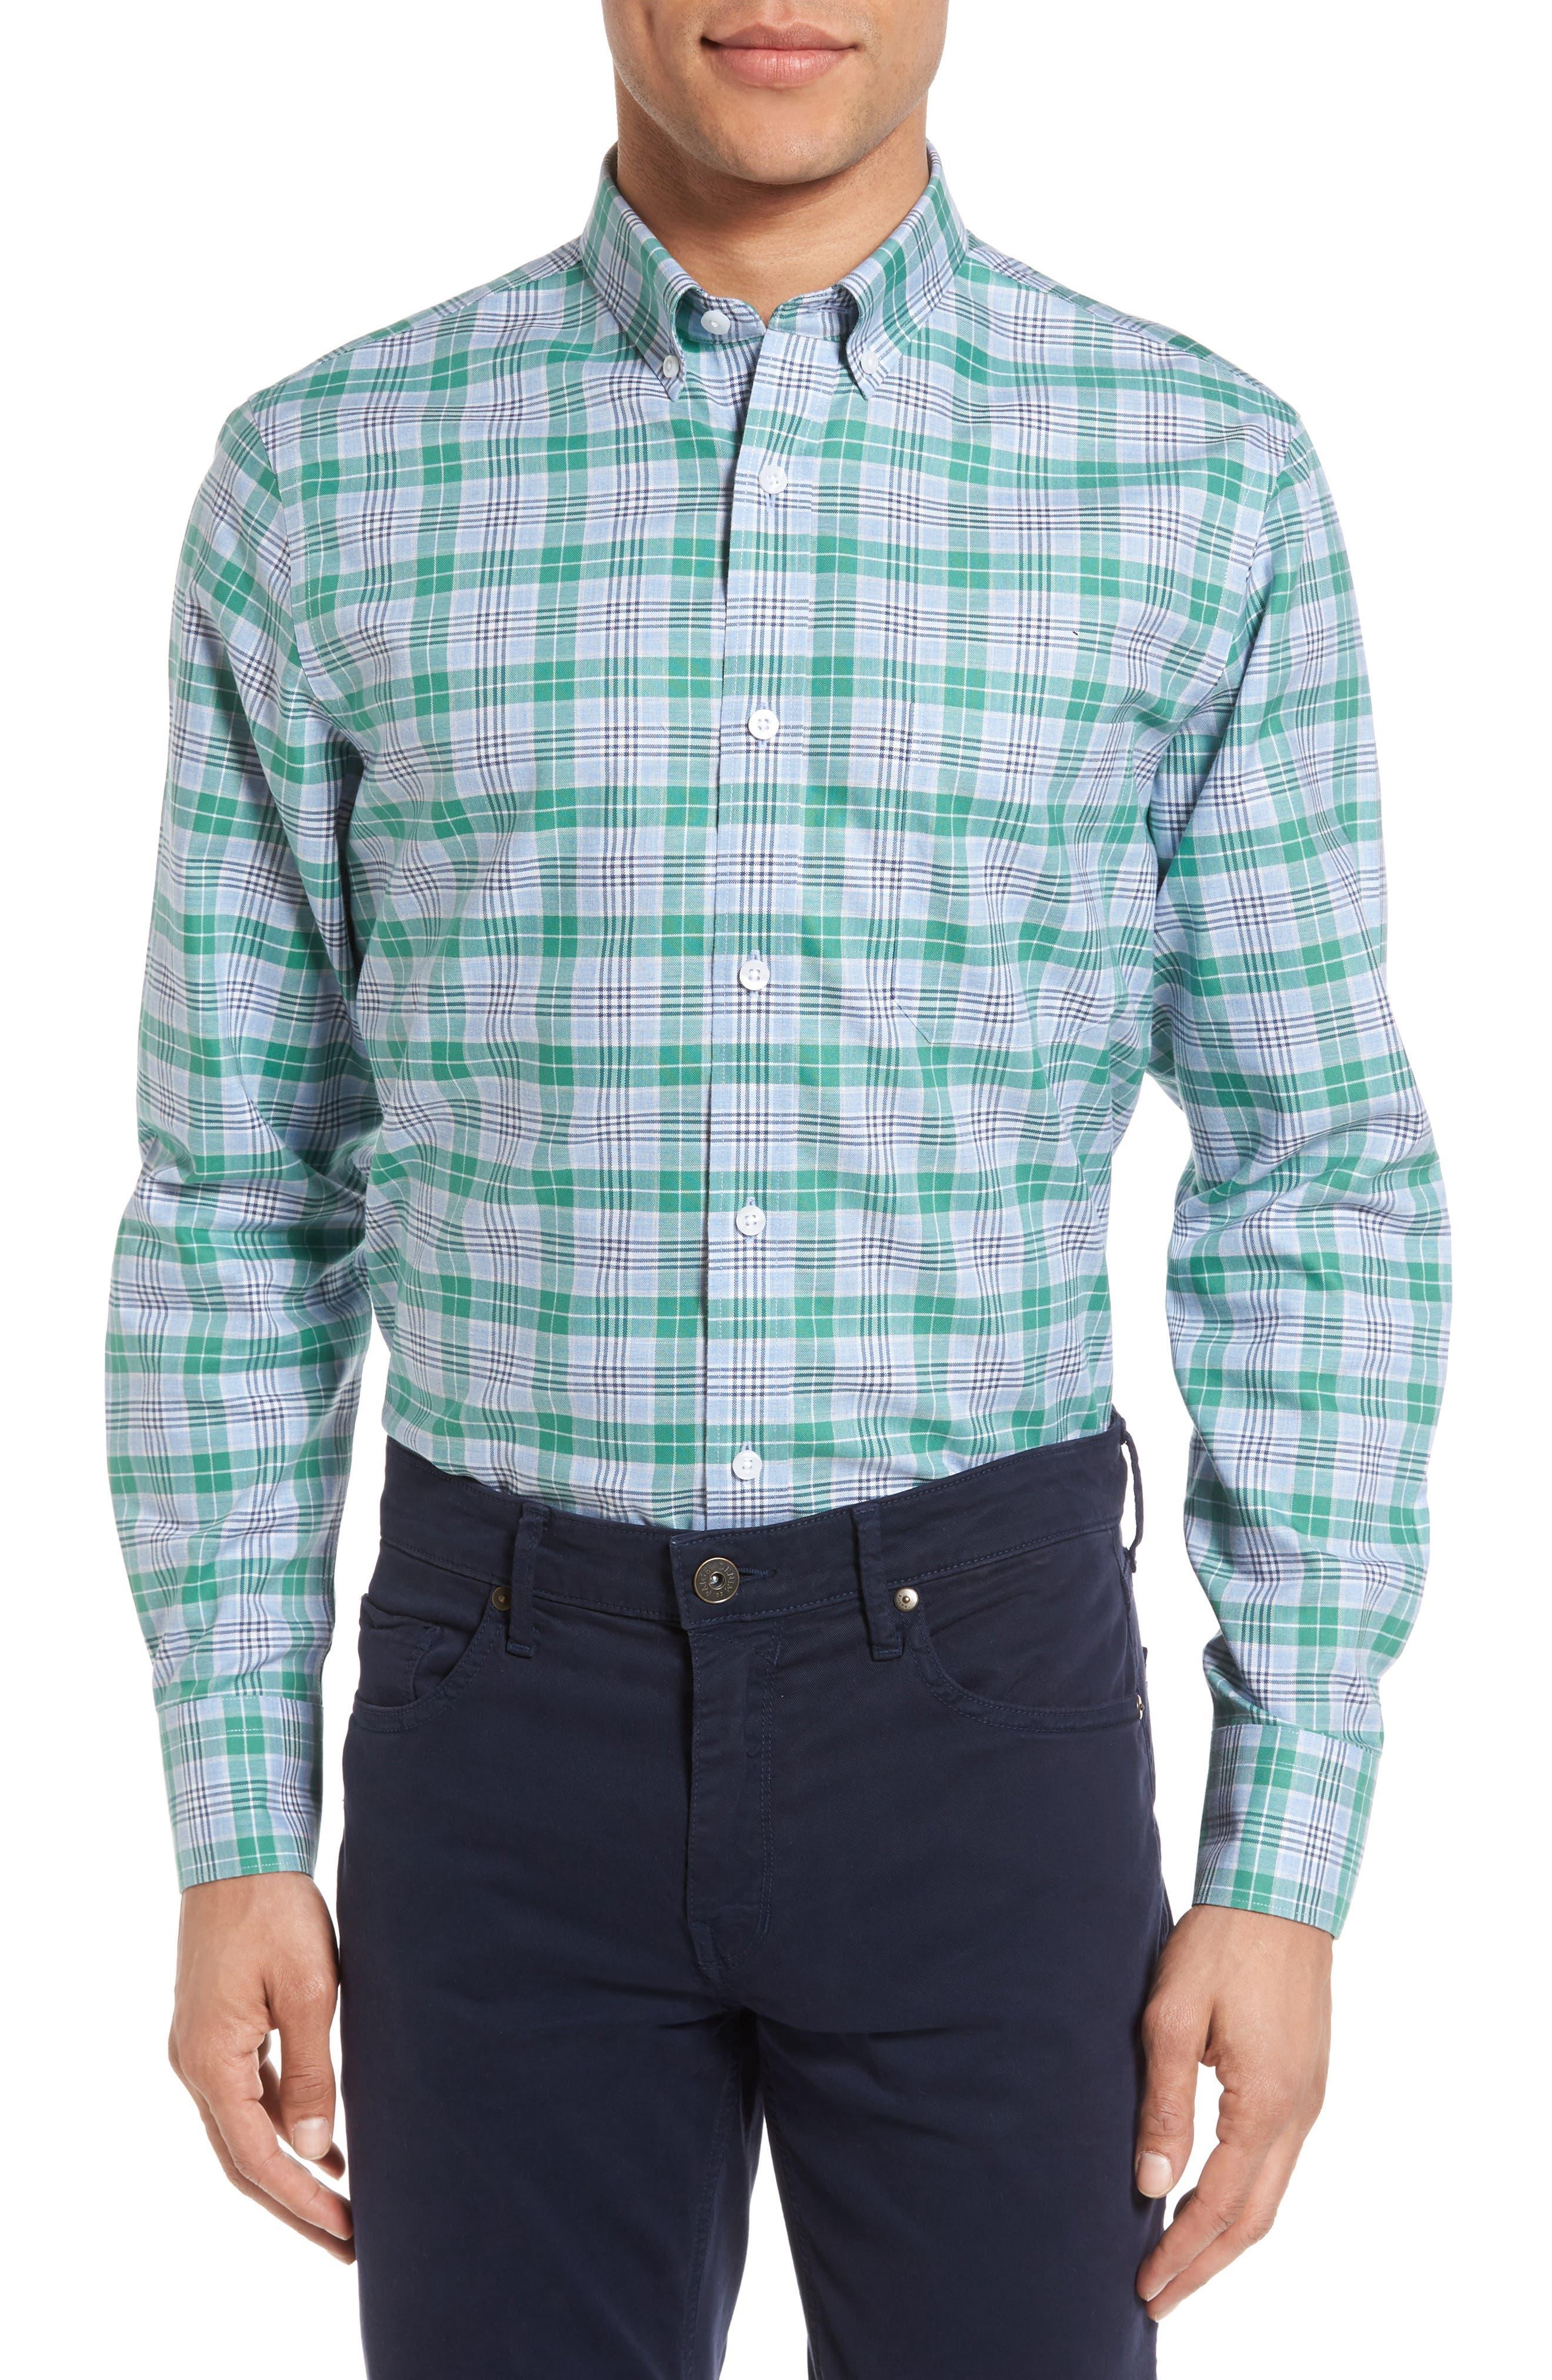 NORDSTROM MENS SHOP Smartcare<sup>™</sup> Regular Fit Plaid Sport Shirt